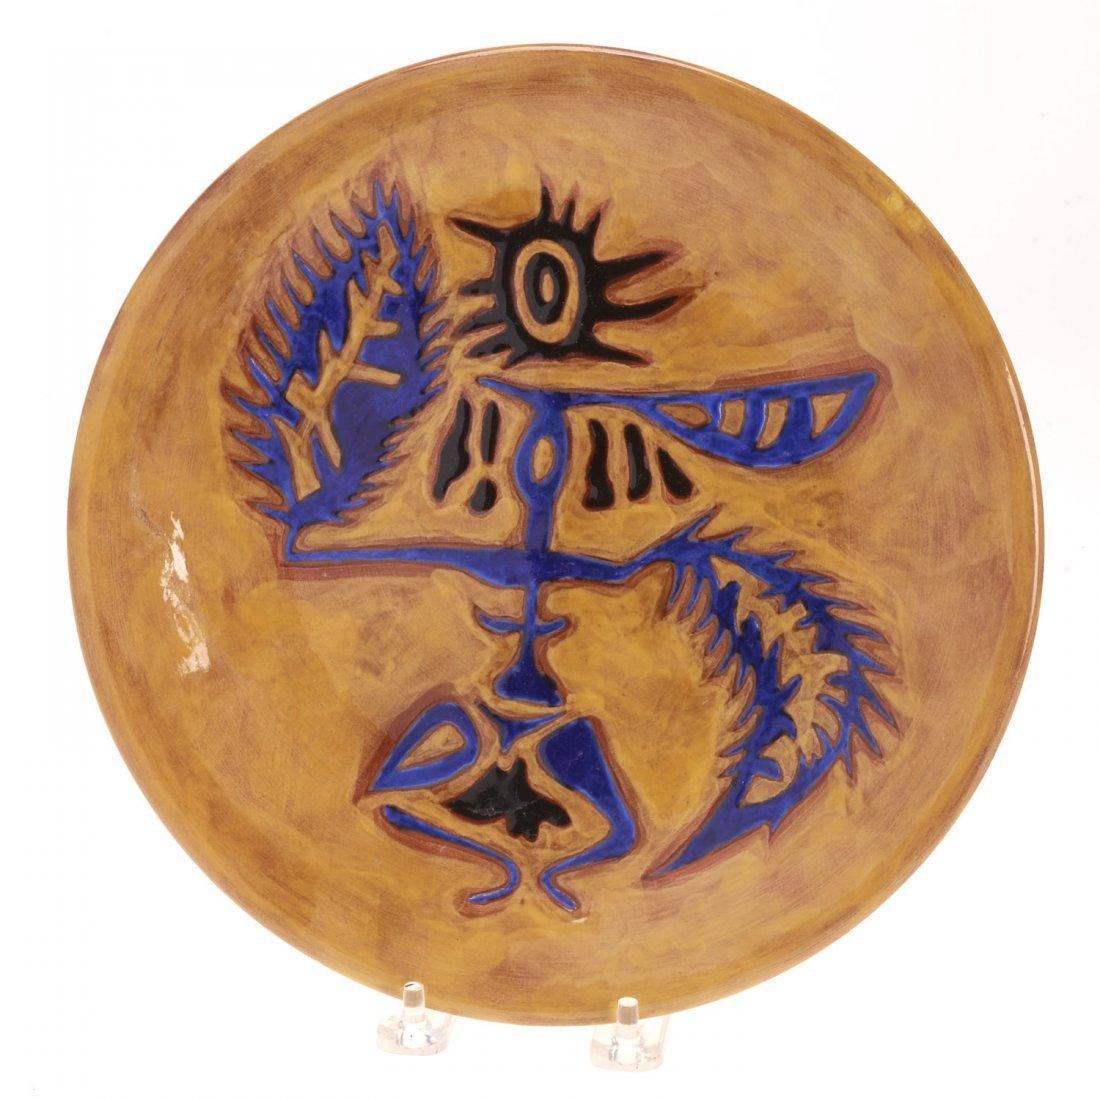 Jean Lurcat glazed ceramic dish